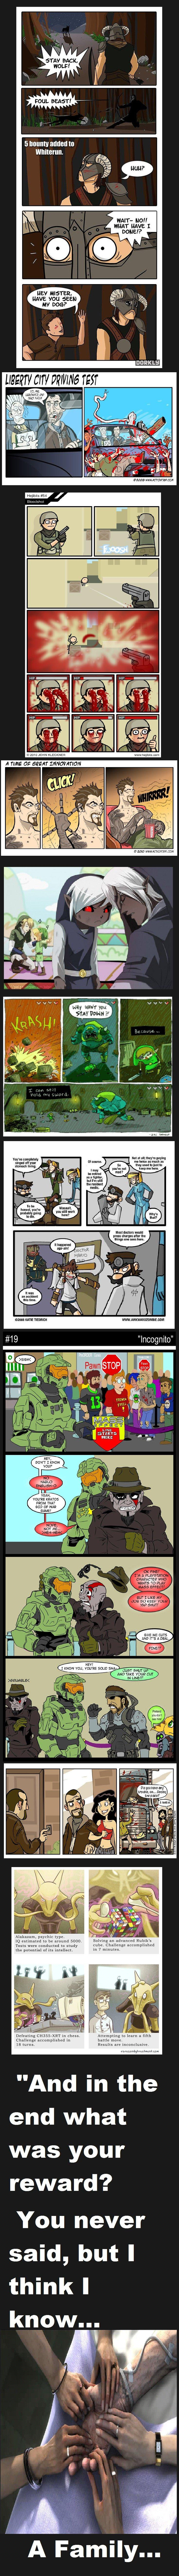 gaming comp 4. .. The last one. FEELS. FEELS EVERYWHERE. The Game videogame Bioshock